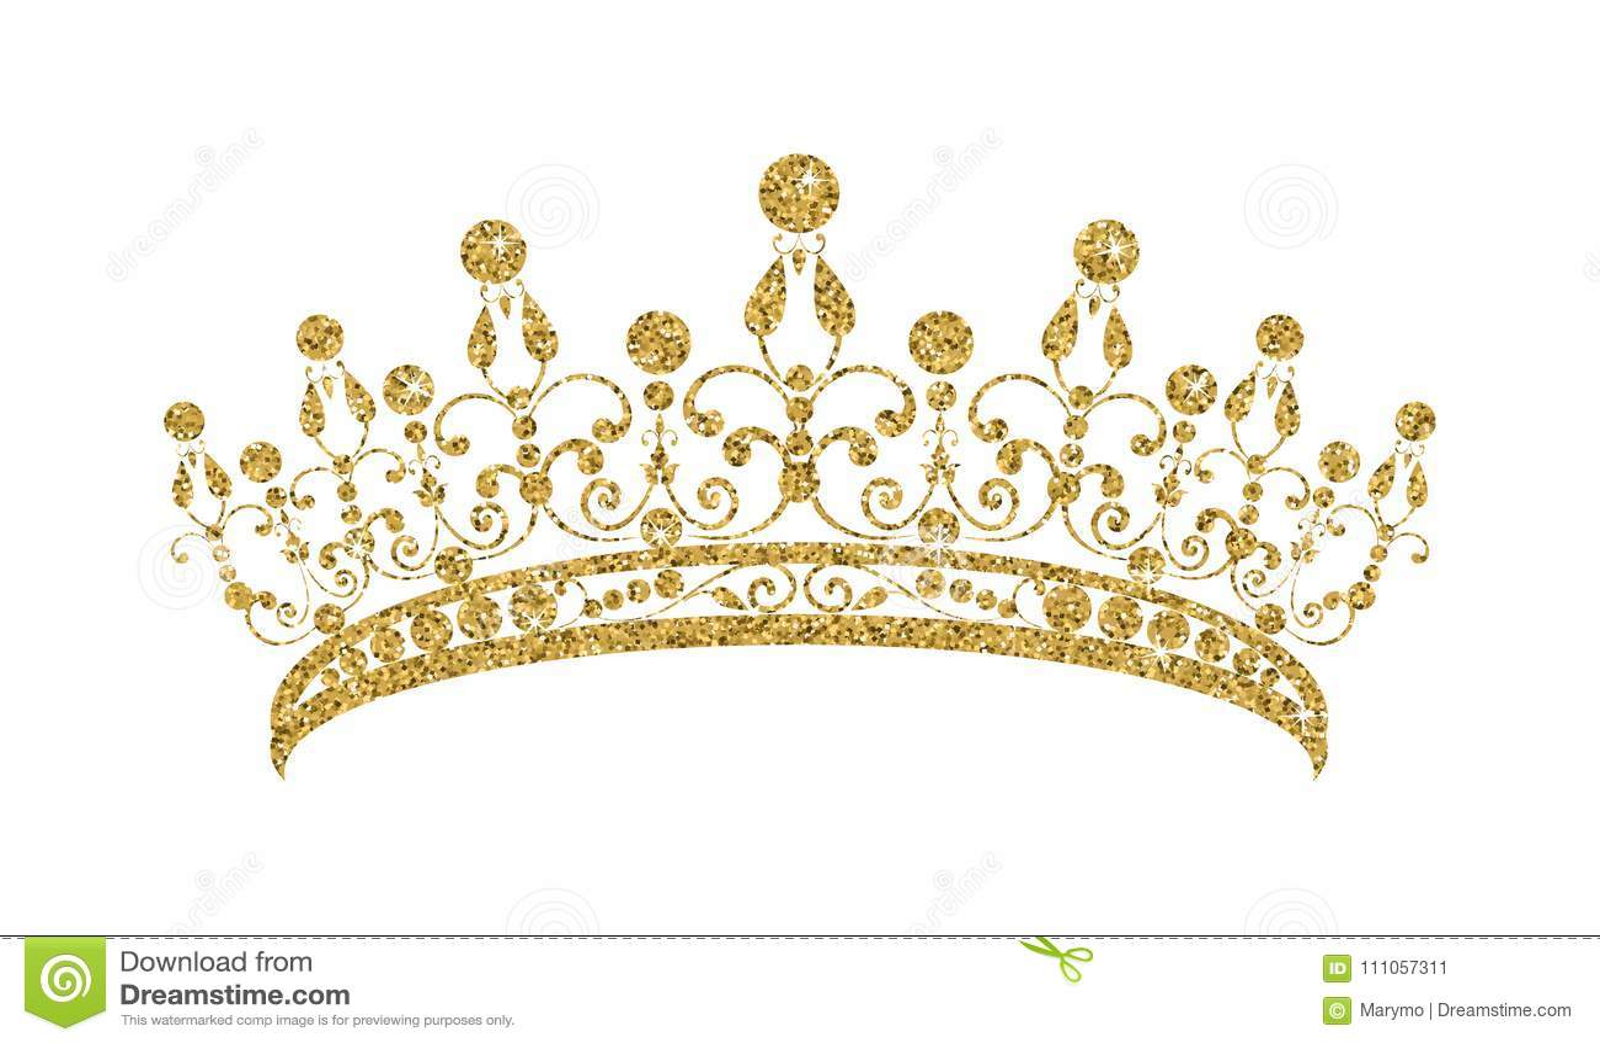 Glittering Diadem. Golden tiara isolated on white background.